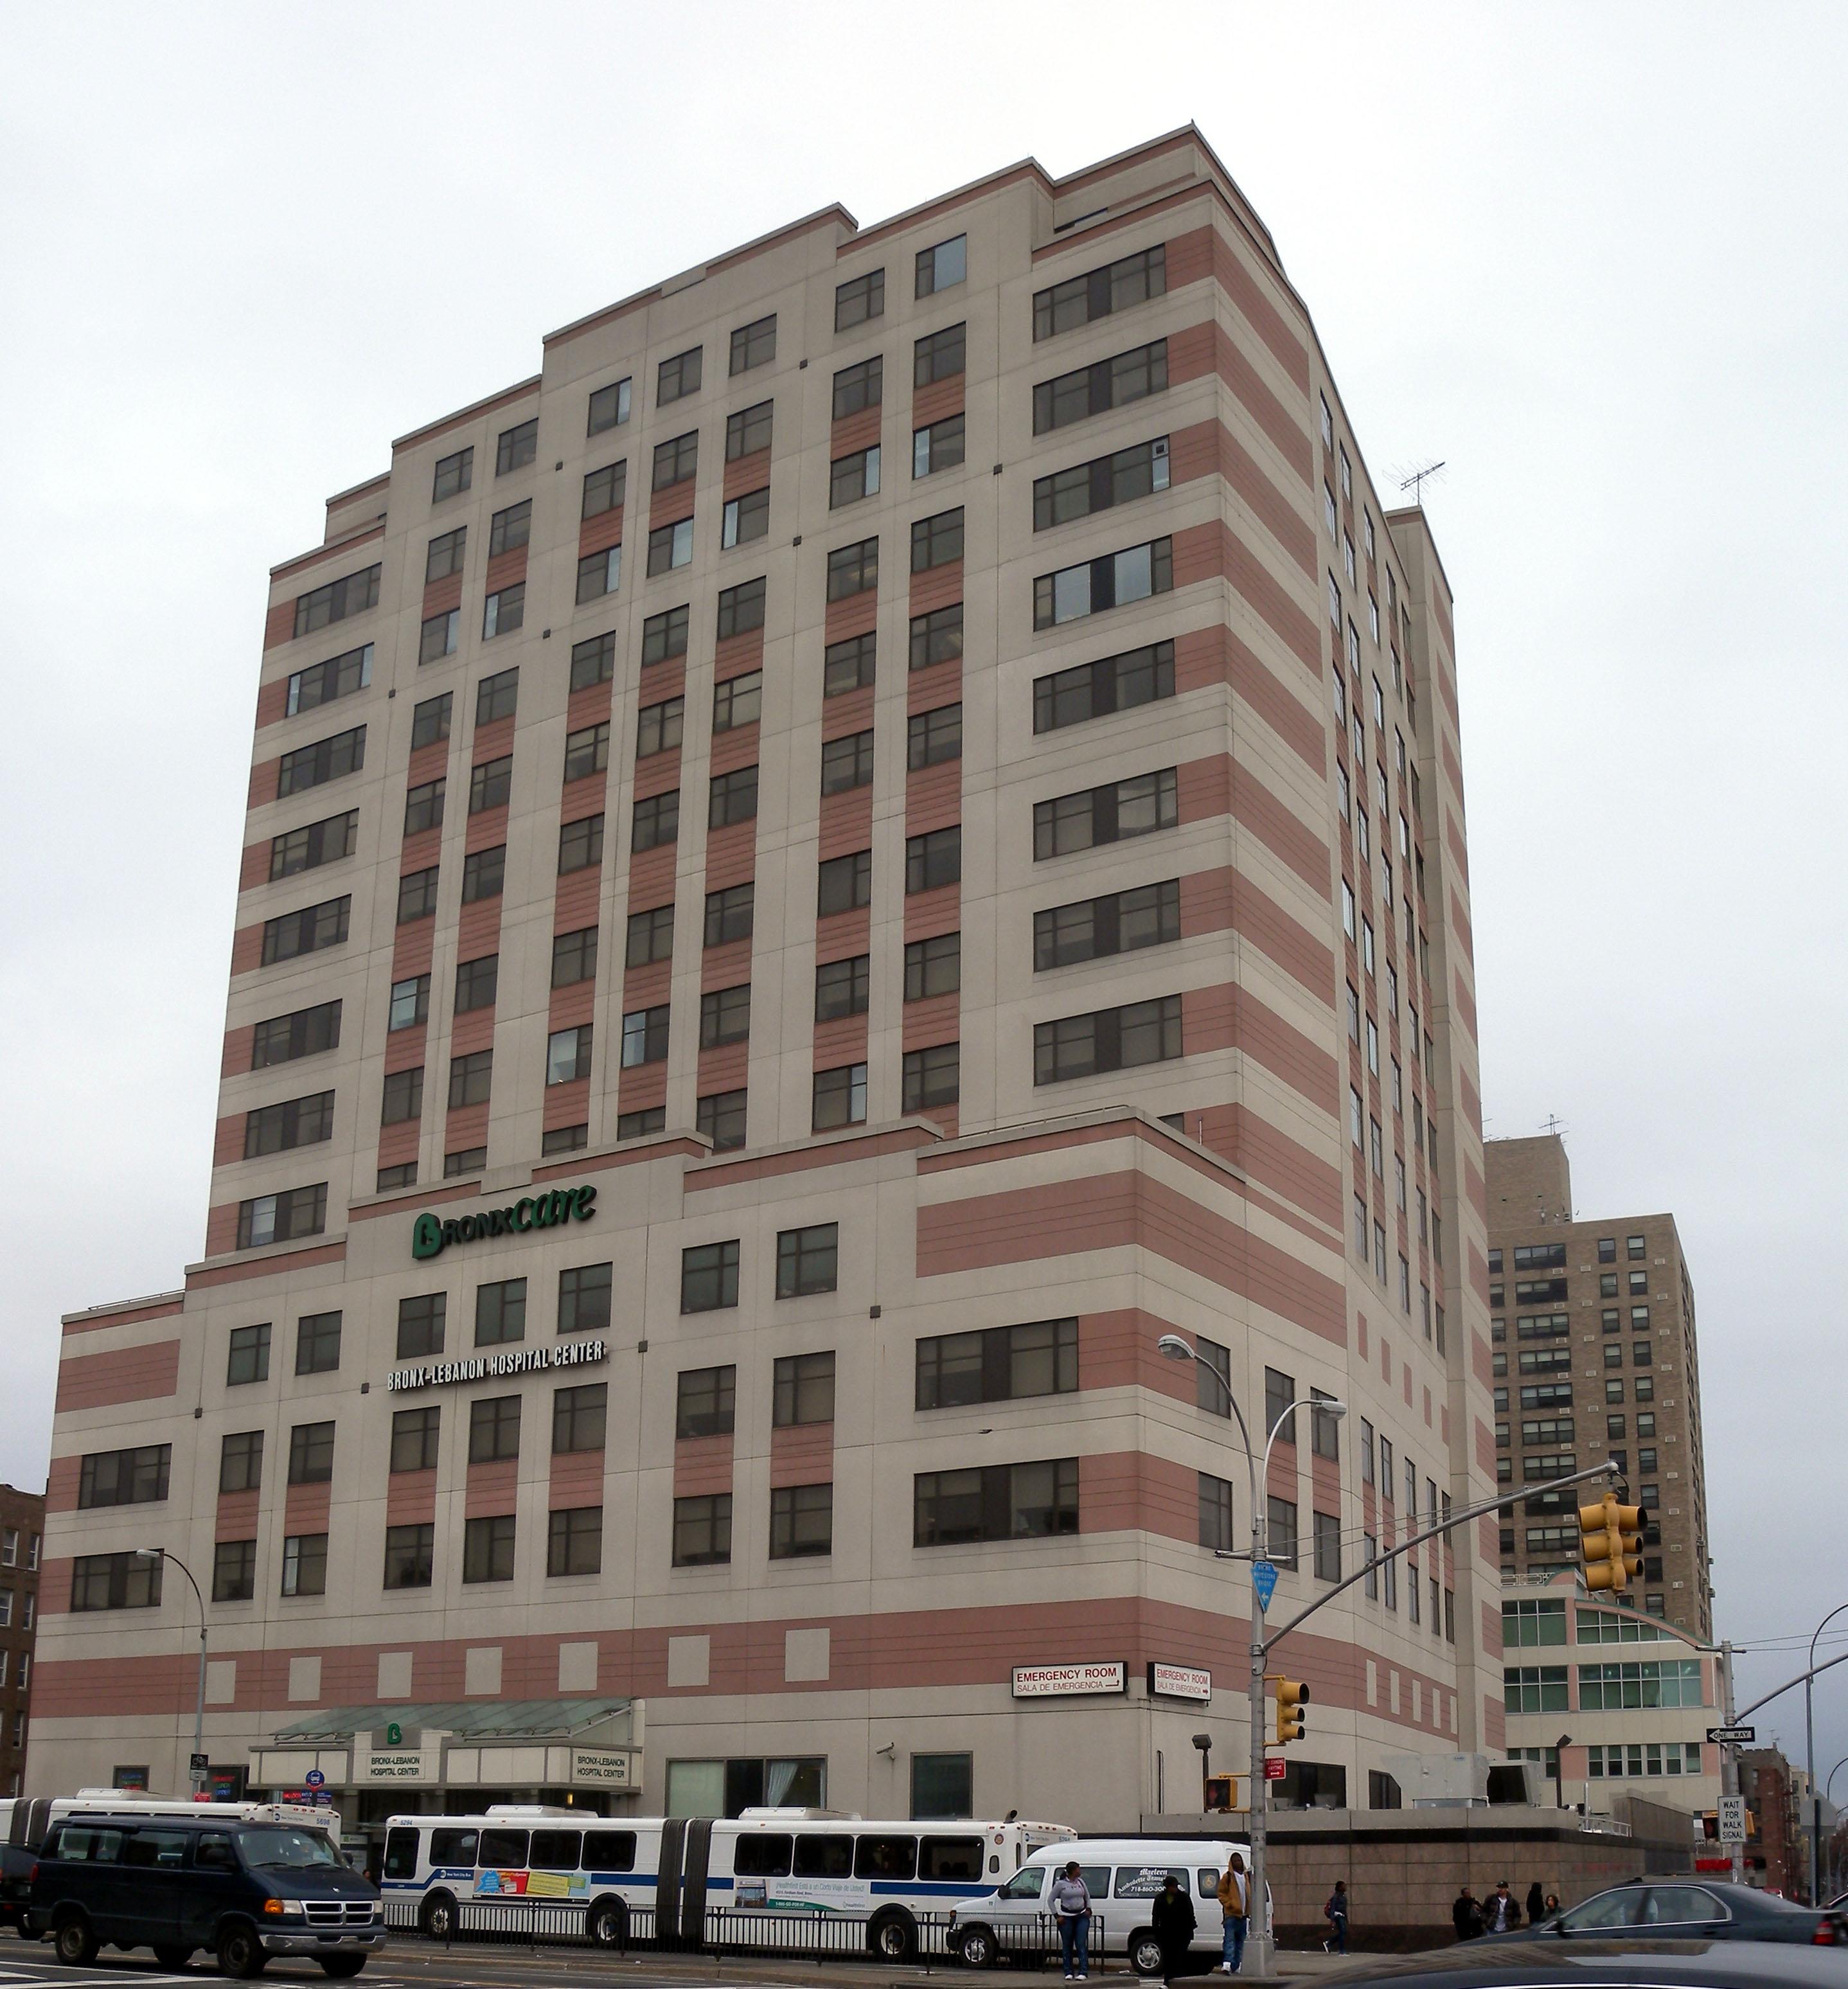 Bronx-Lebanon Hospital Center - Wikipedia